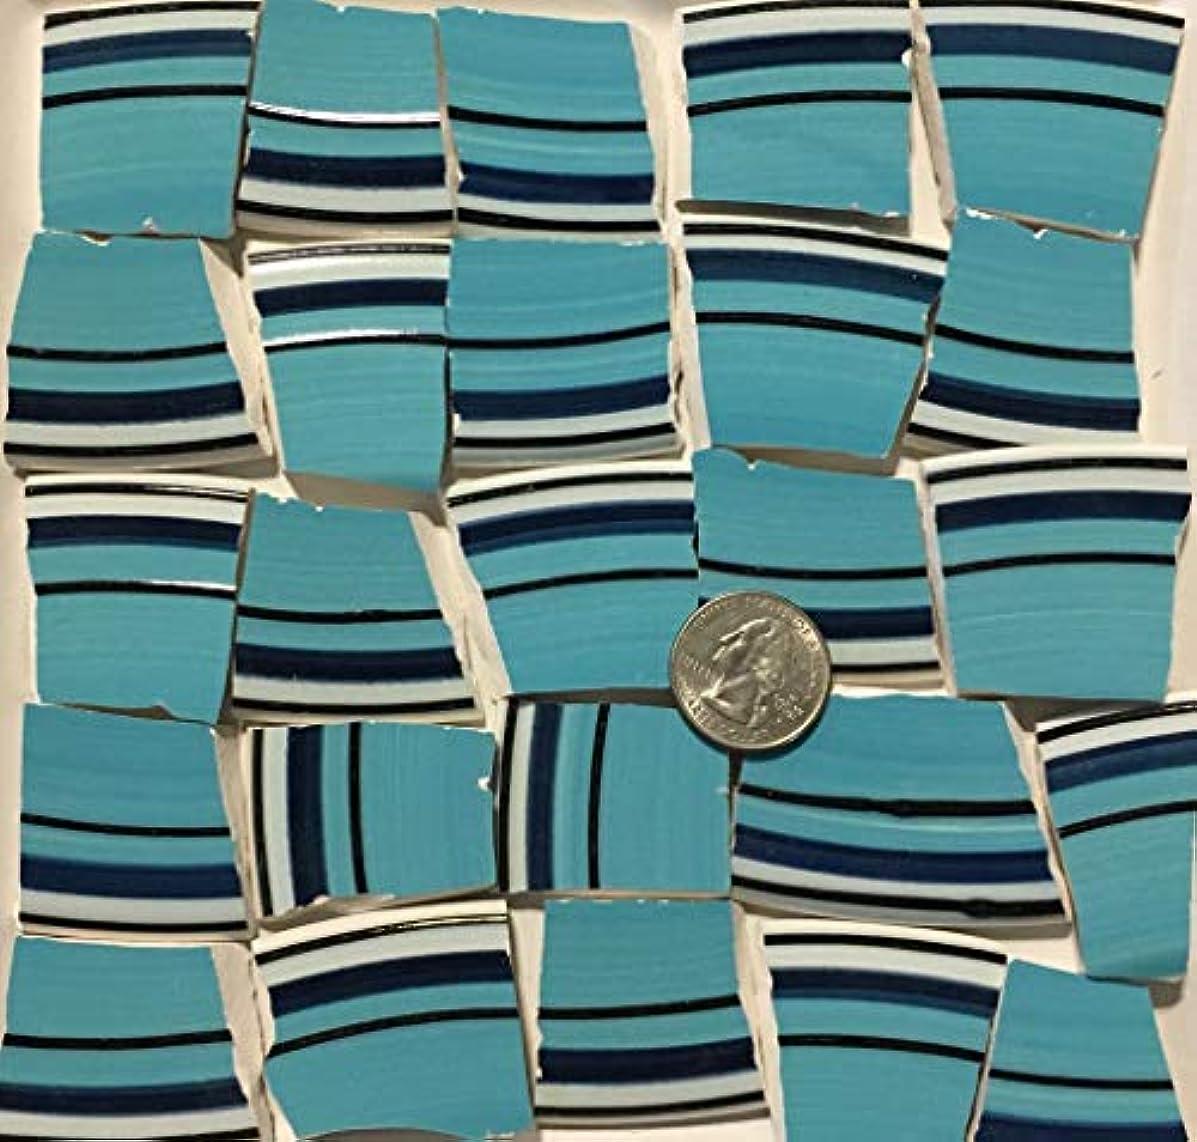 Mosaic Art & Crafts Supply ~ Turquoise Blue & Navy Rim Tiles (B746)